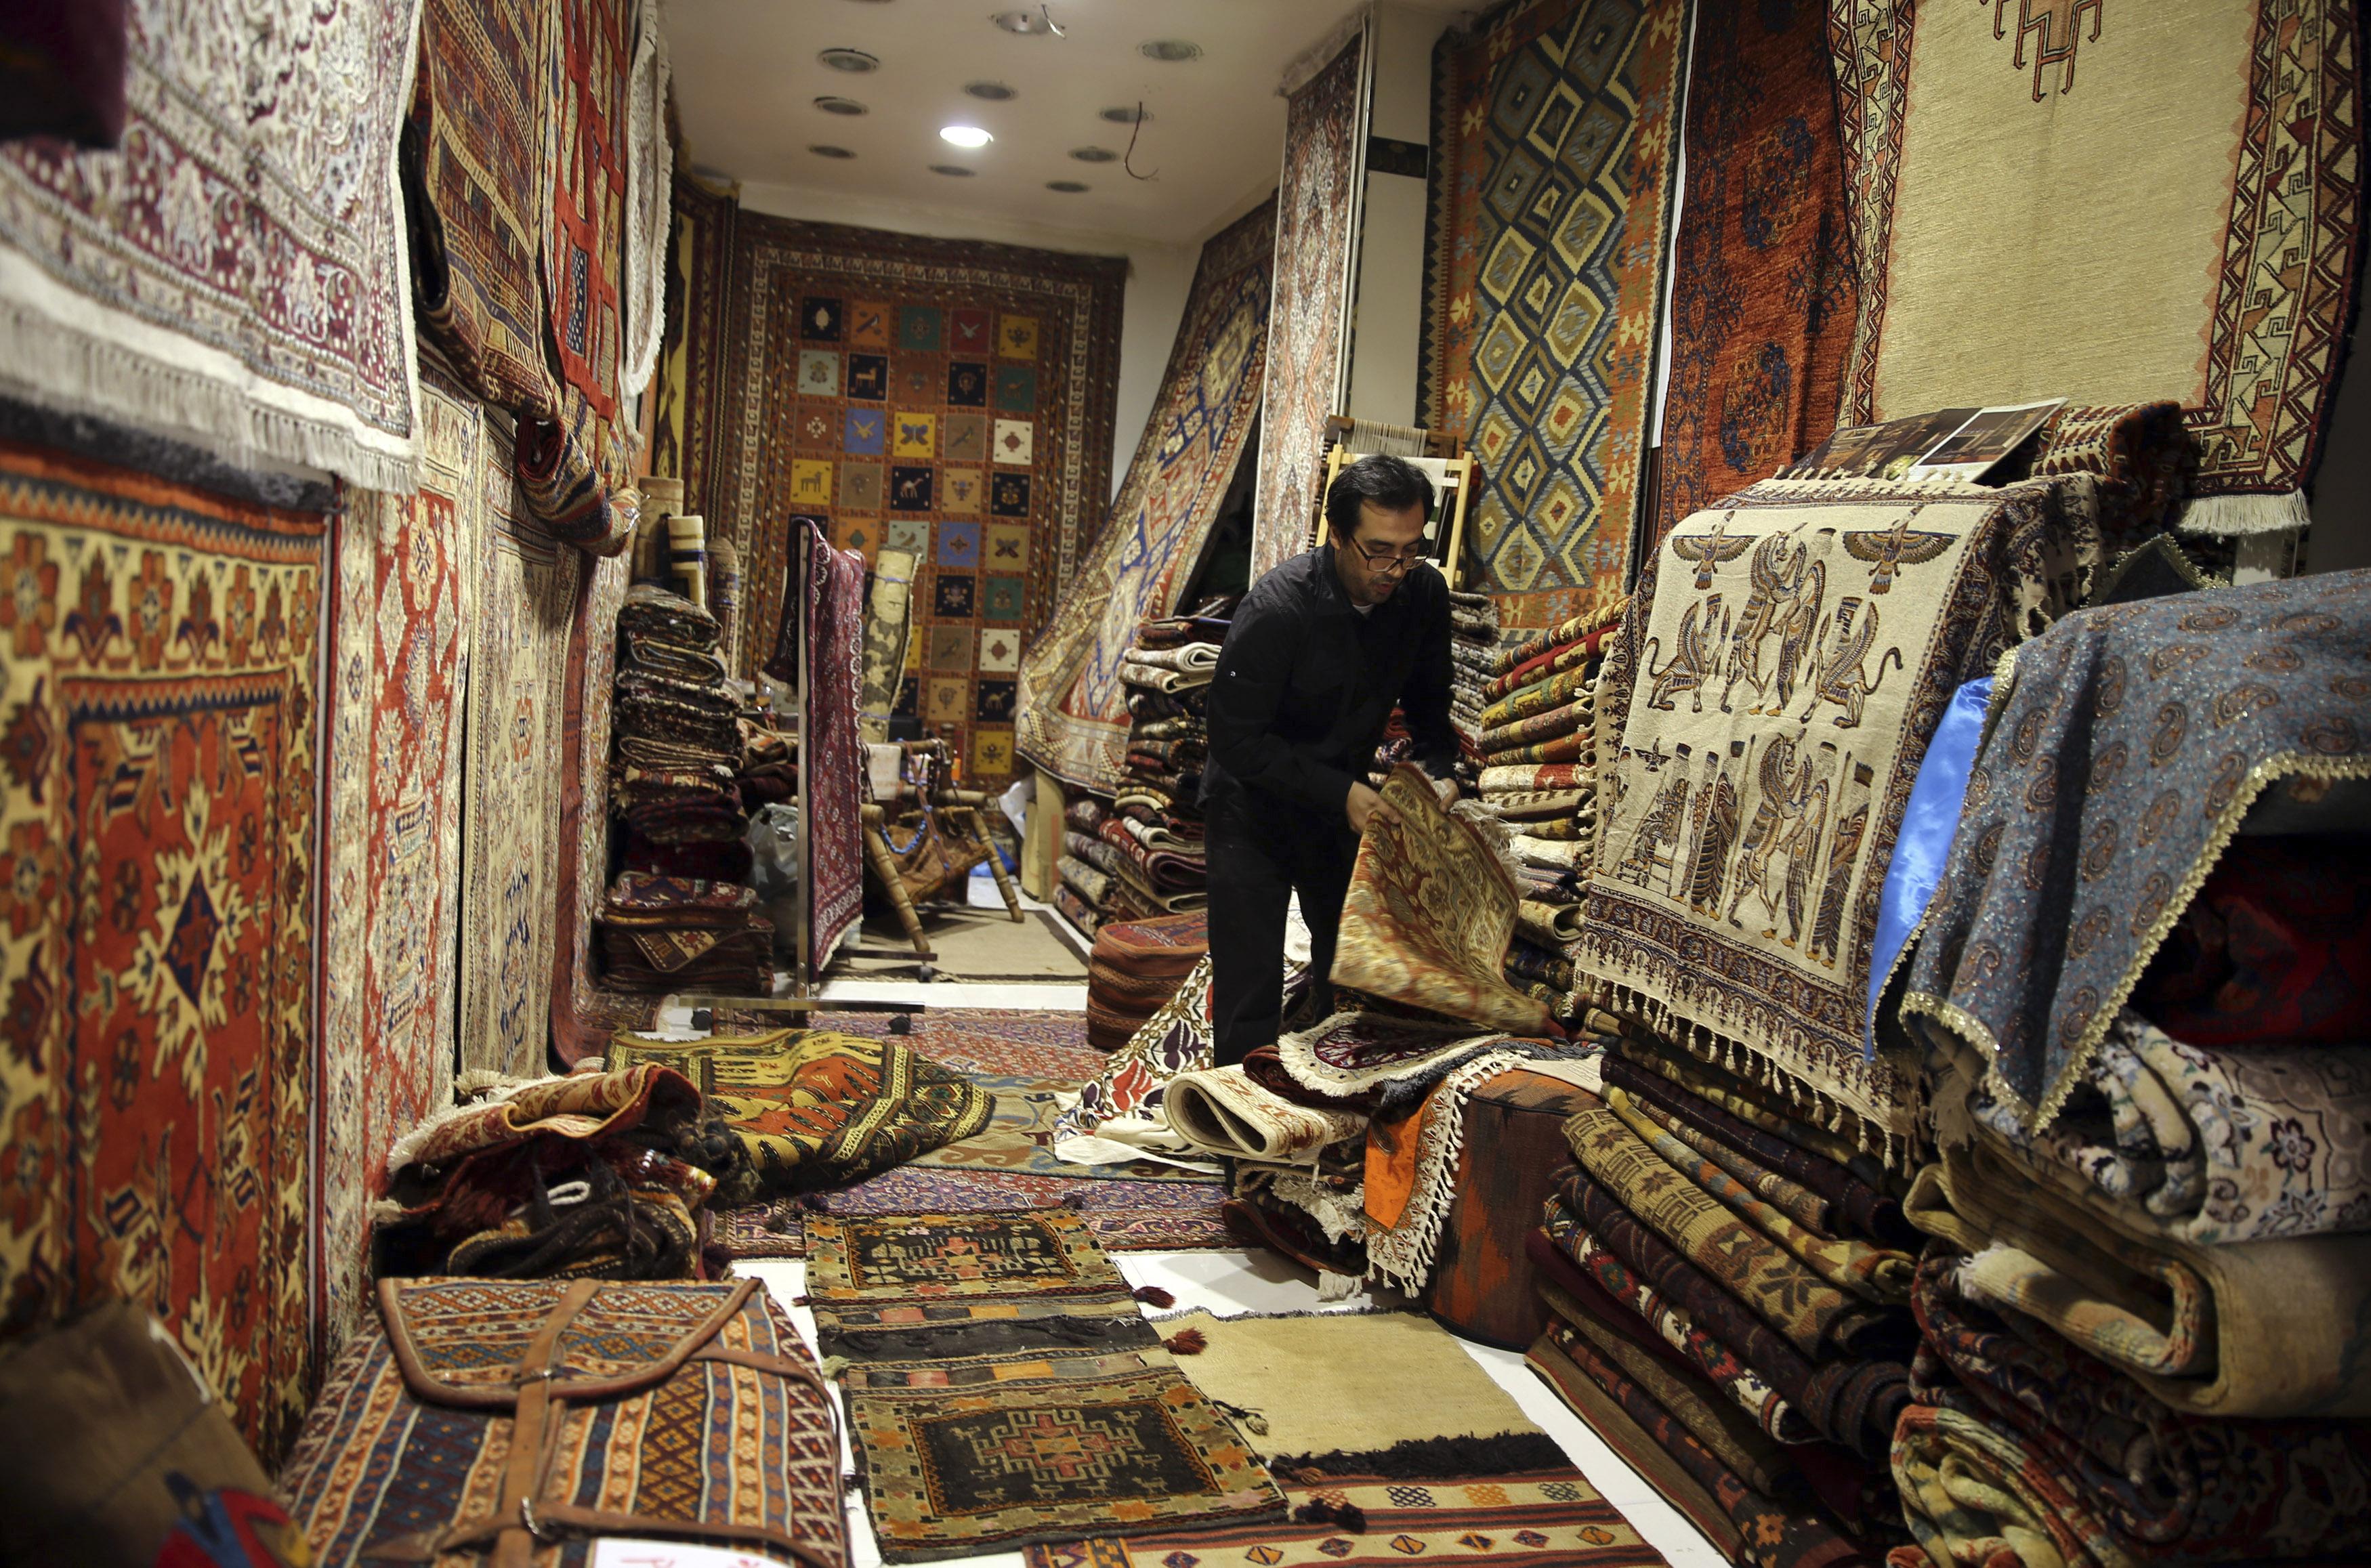 A seller arranges Iranian carpets at his shop in Dubai old market November 24, 2013.